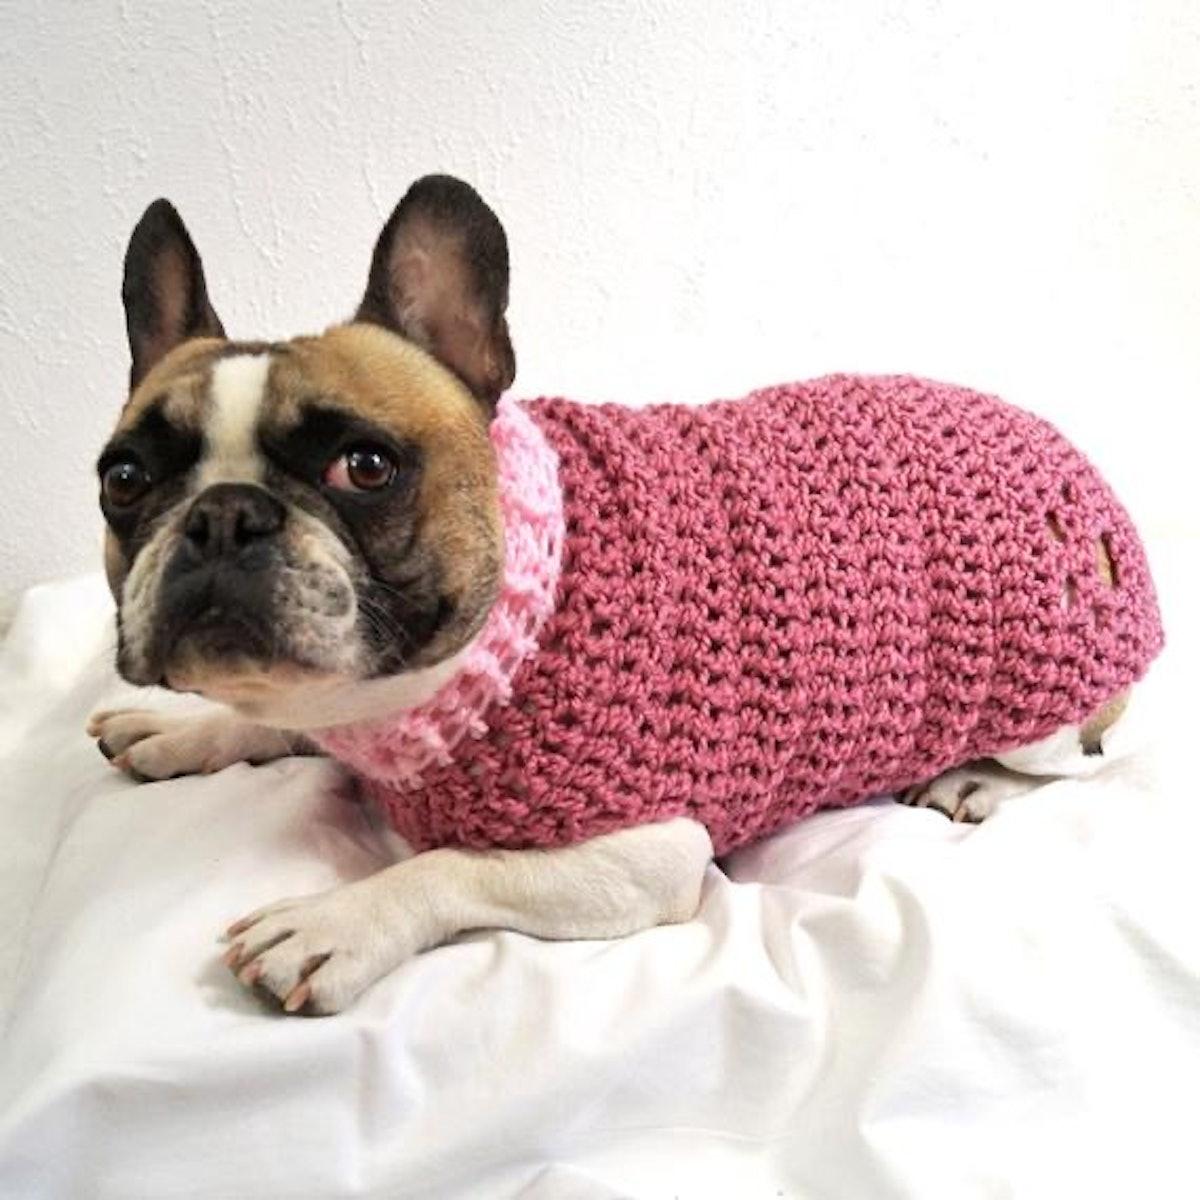 Crocheted Paw-Print Dog Jumper